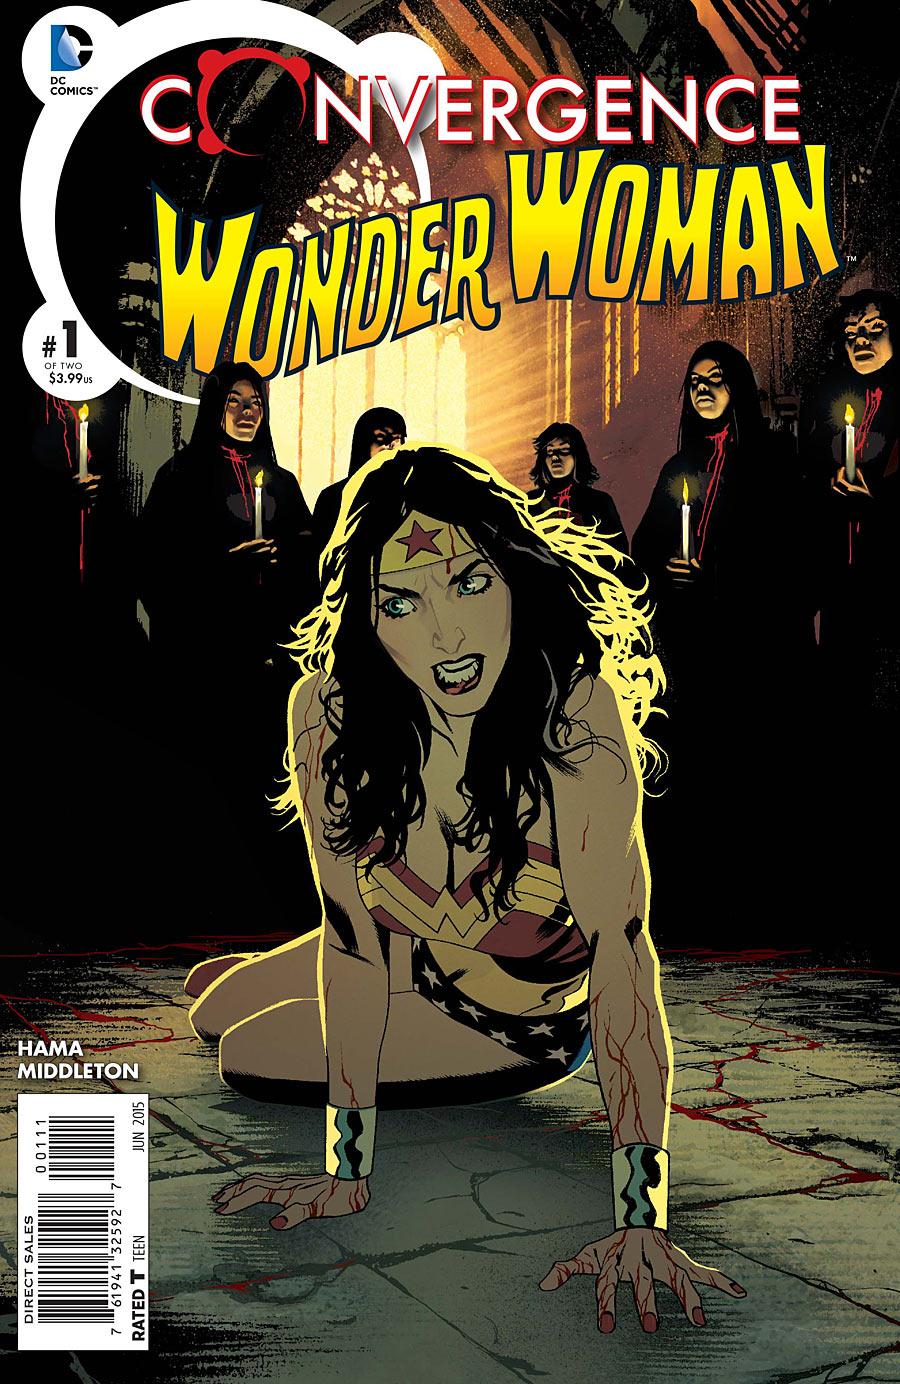 Convergence : Wonder Woman #1